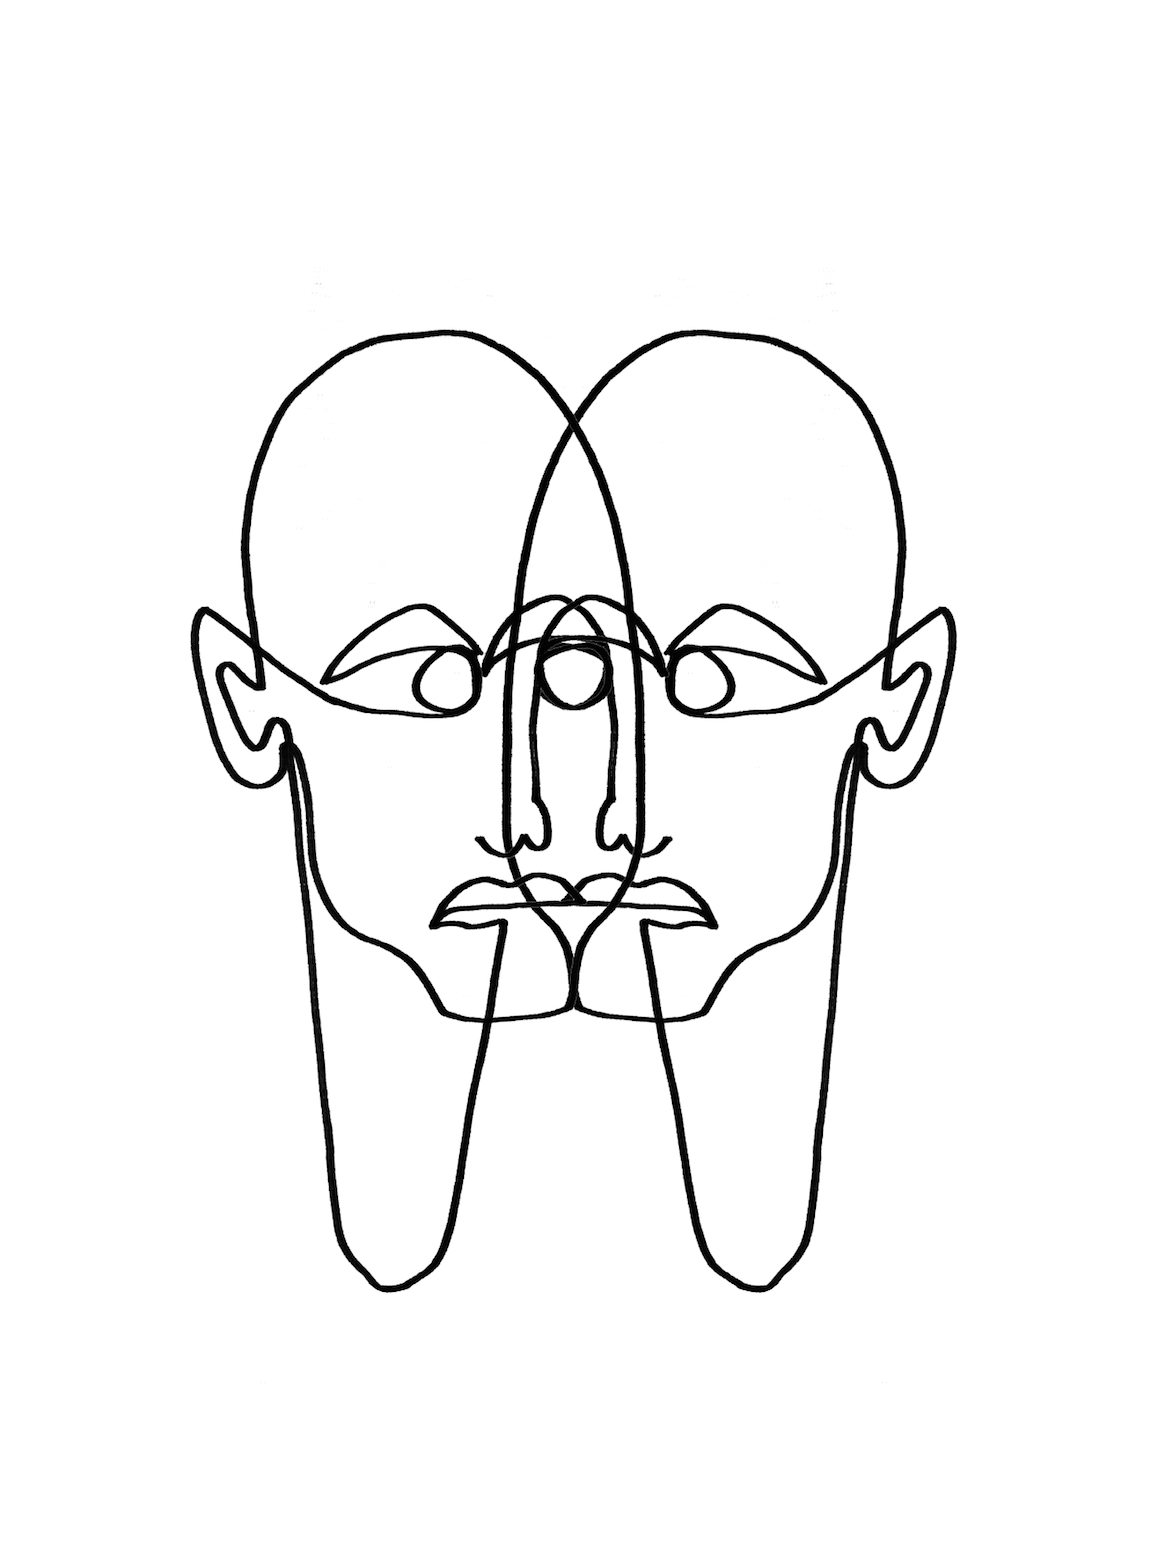 Face Two Face Linework By Julia Hariri Linework Artwork Arty Artsy Tattoo Abstract Painting Illustration Portrait Sket Eyes Artwork Artsy Tattoos Face Art